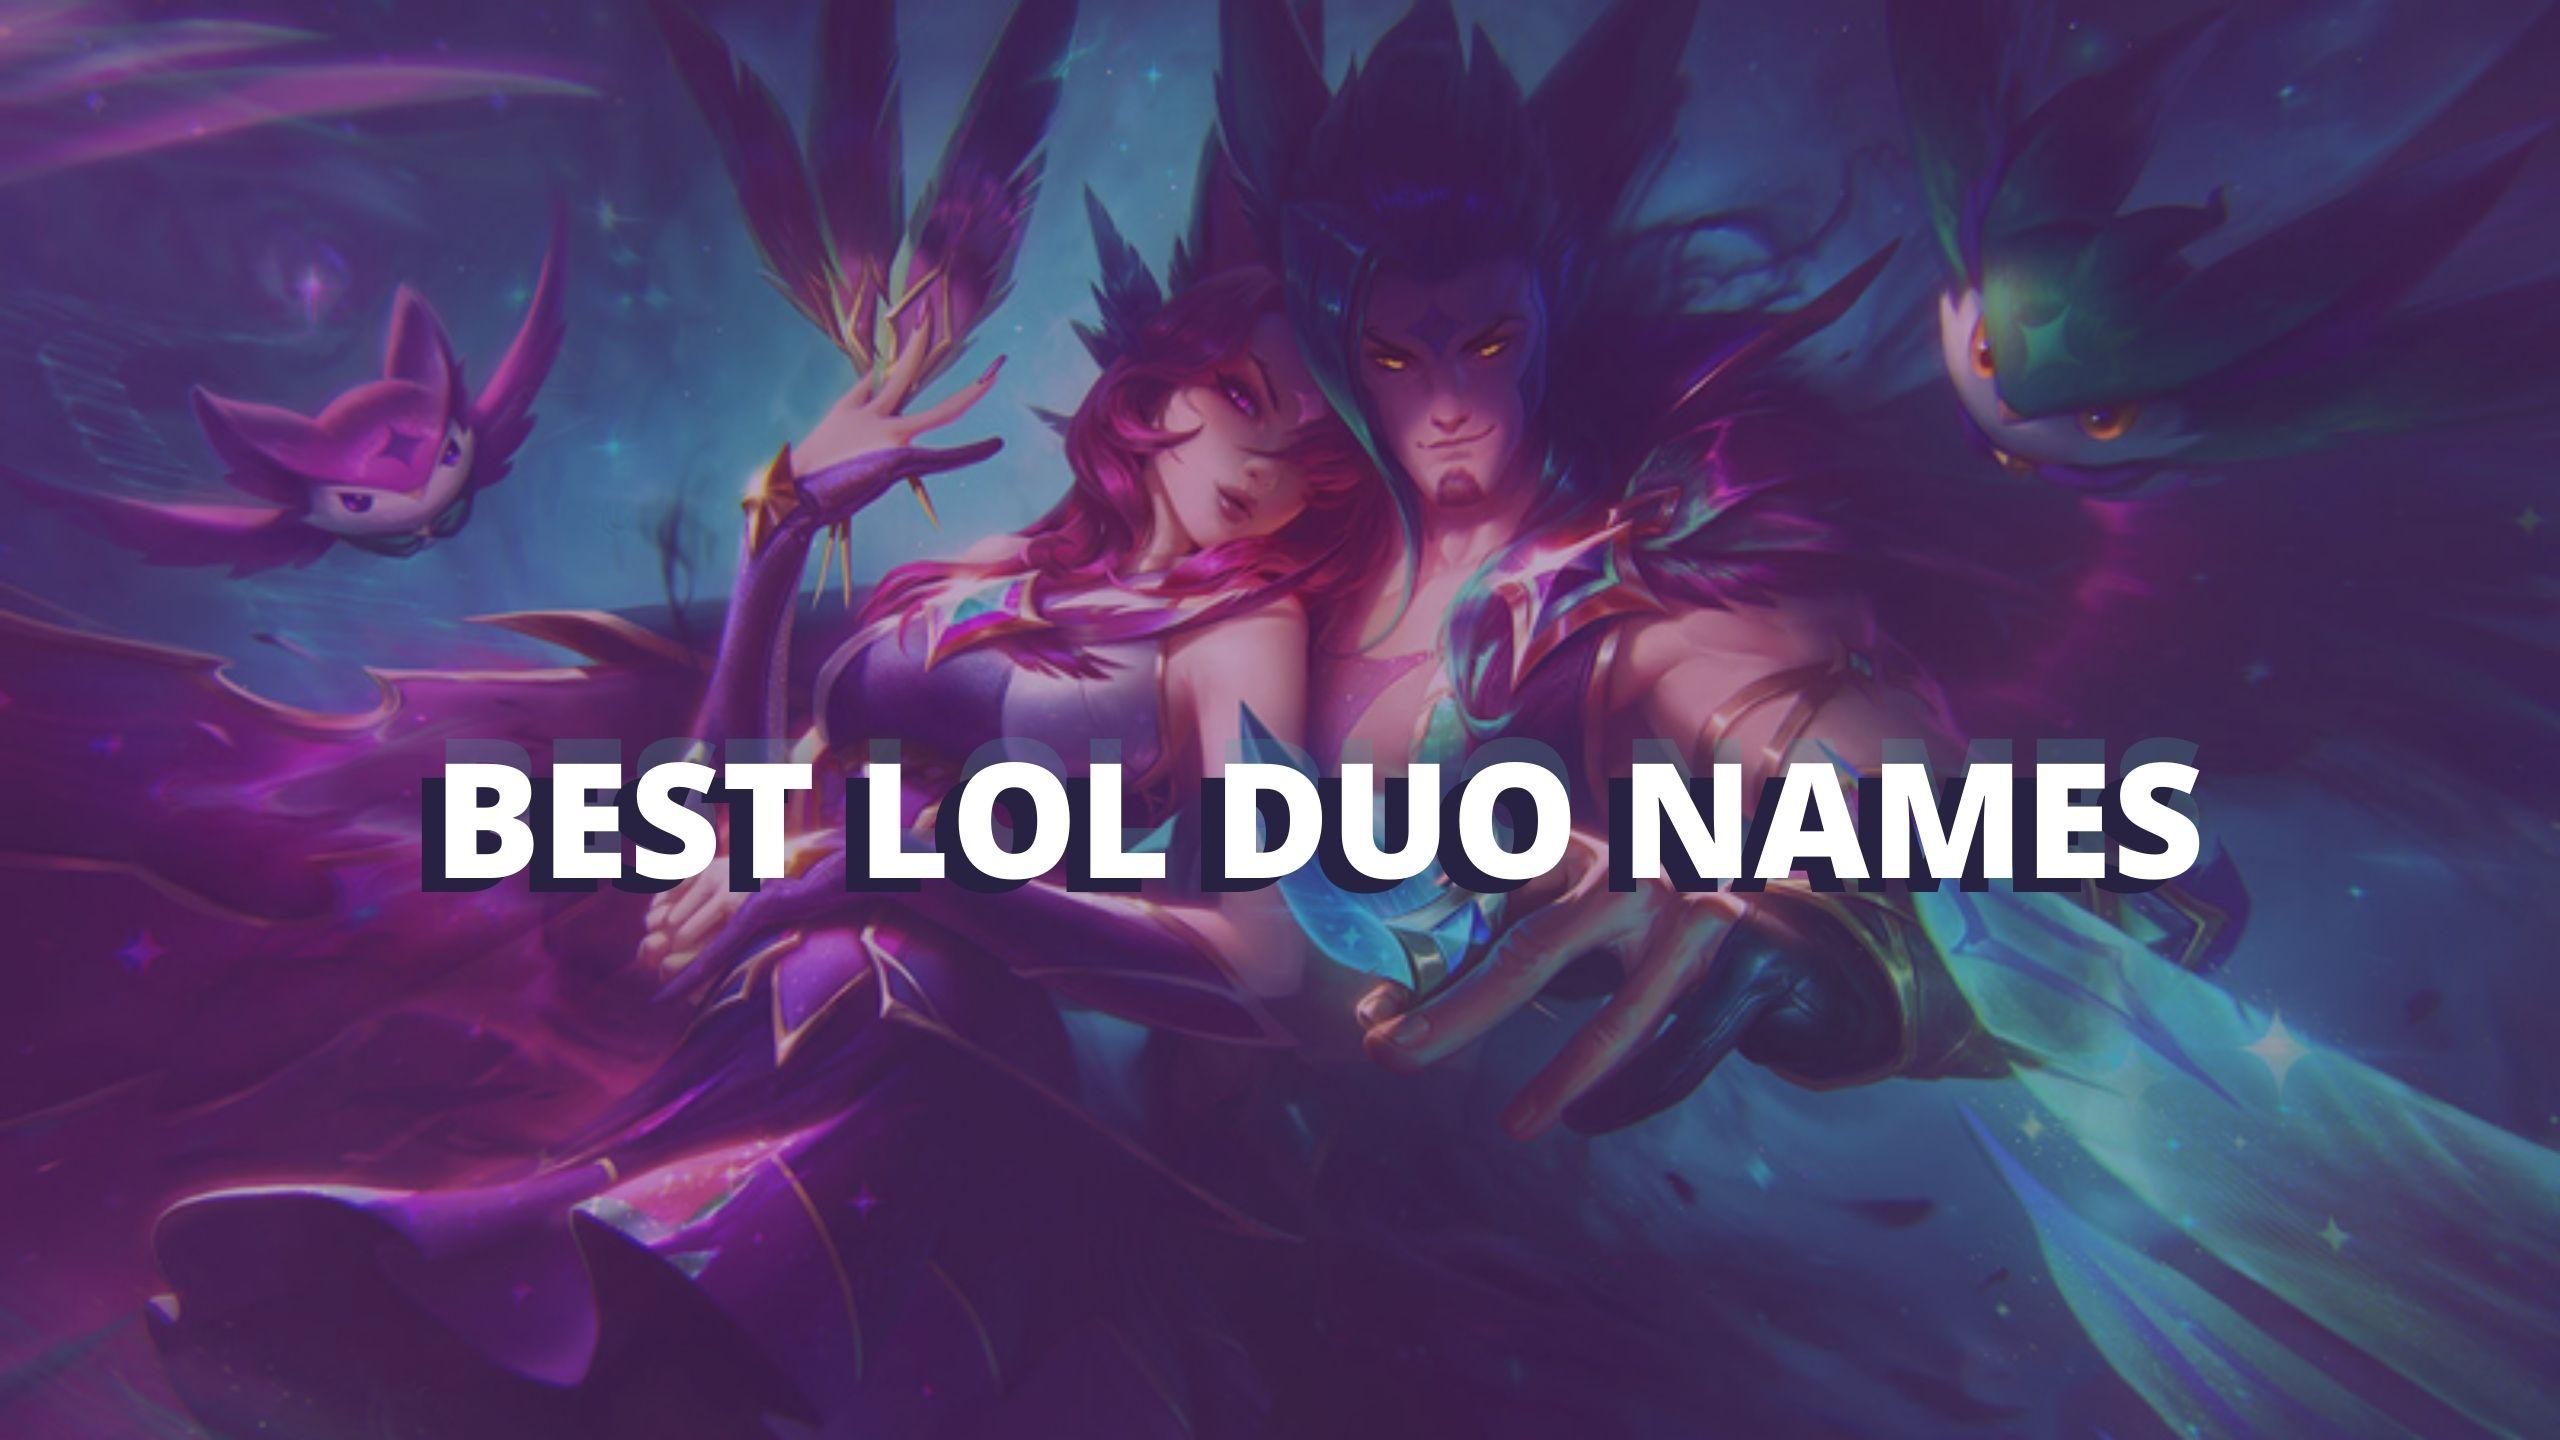 Top 15 LoL Duo Names - (Lmao warning)